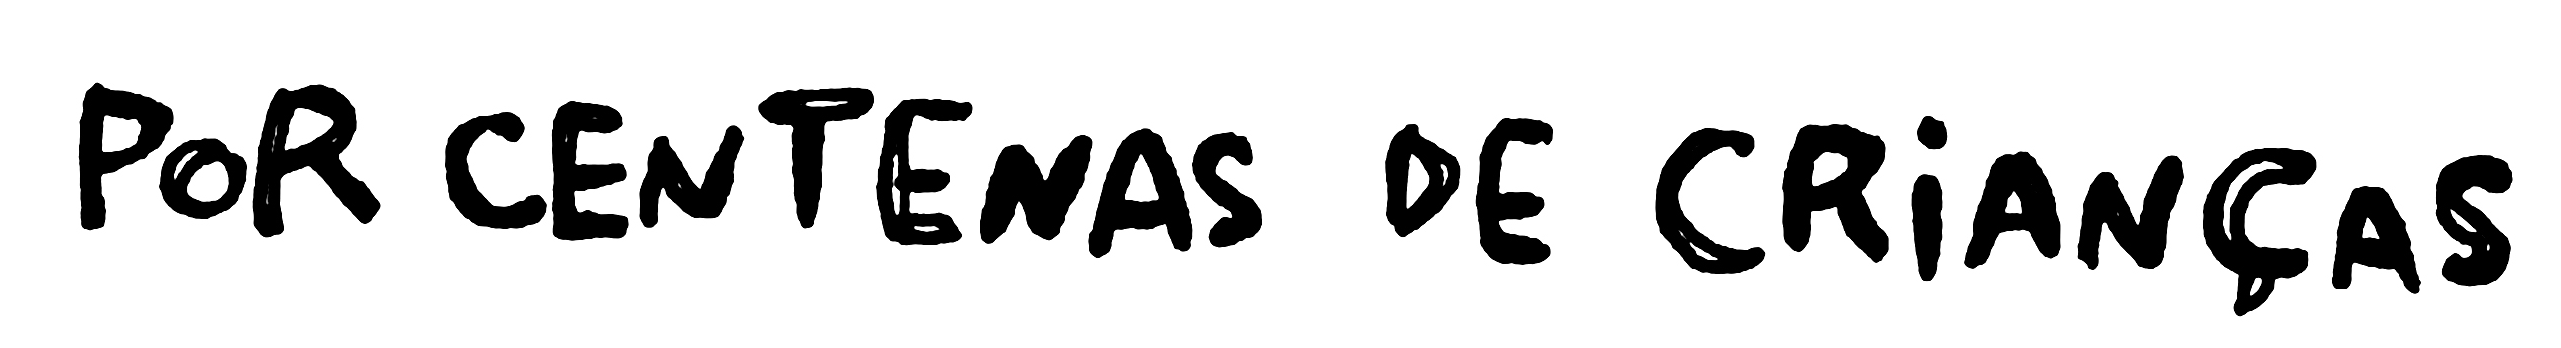 07 caligrafias booktrailer_3